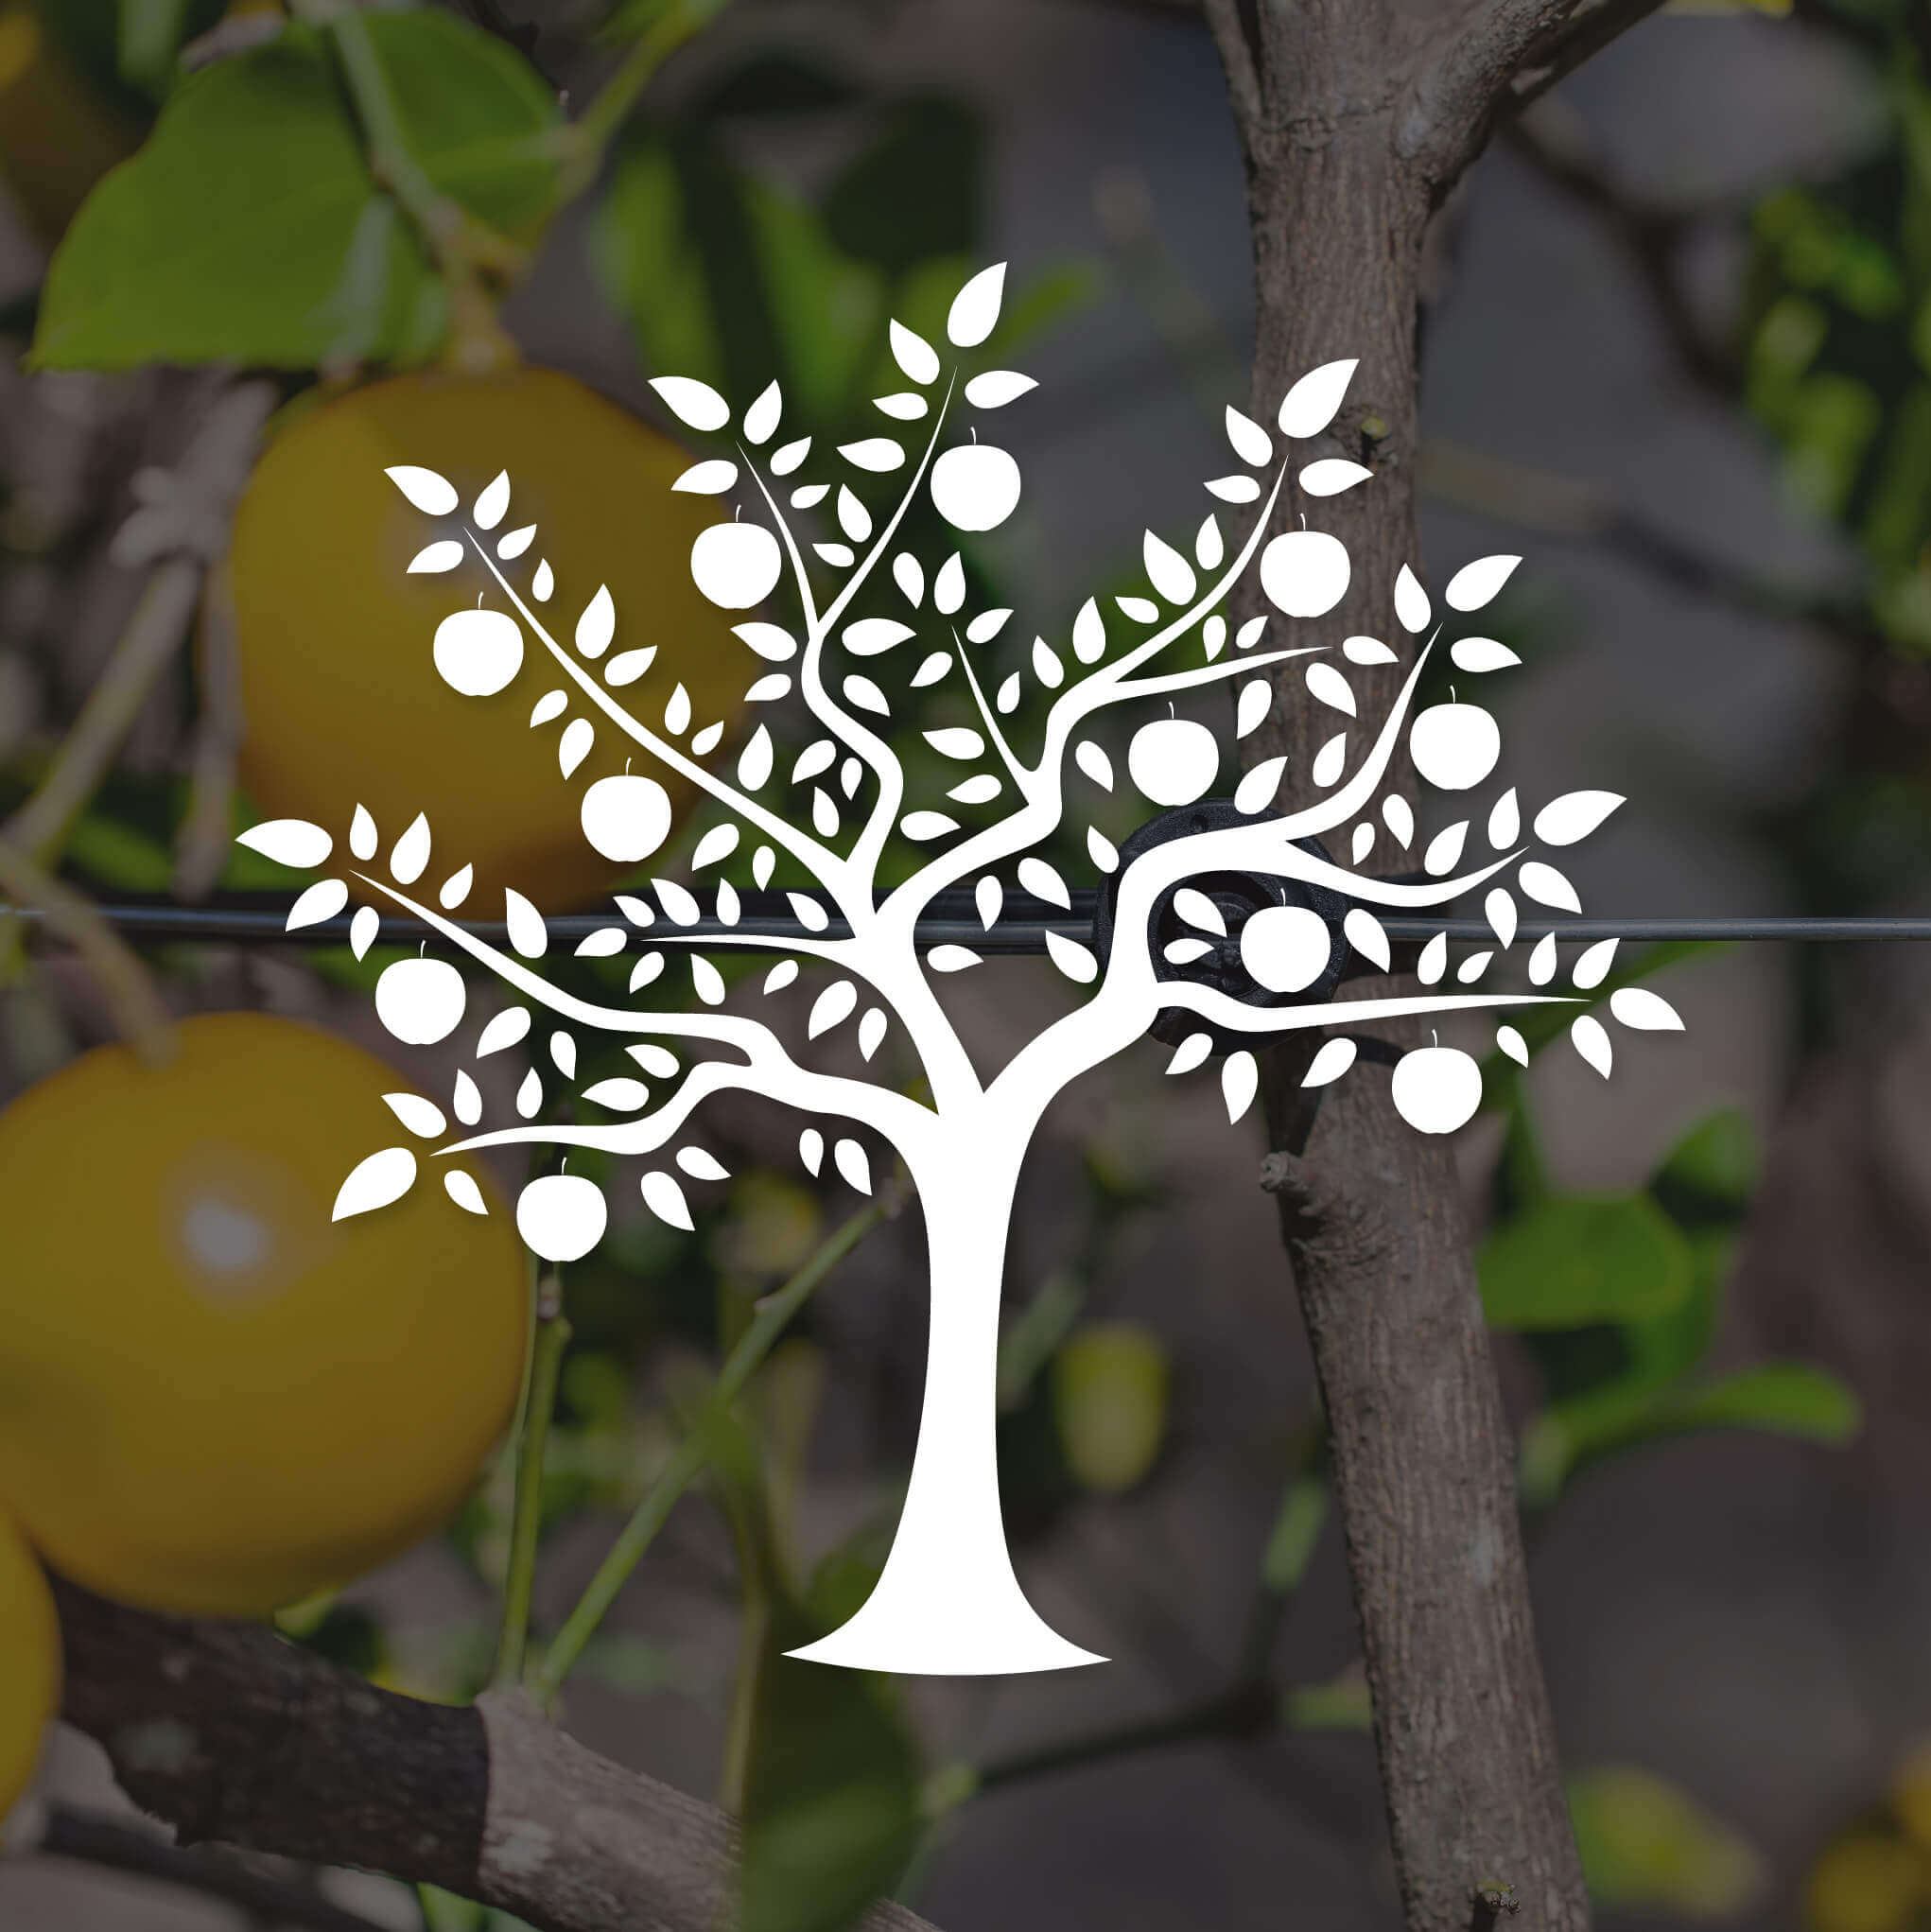 White fruit tree icon against photo of fruit trees